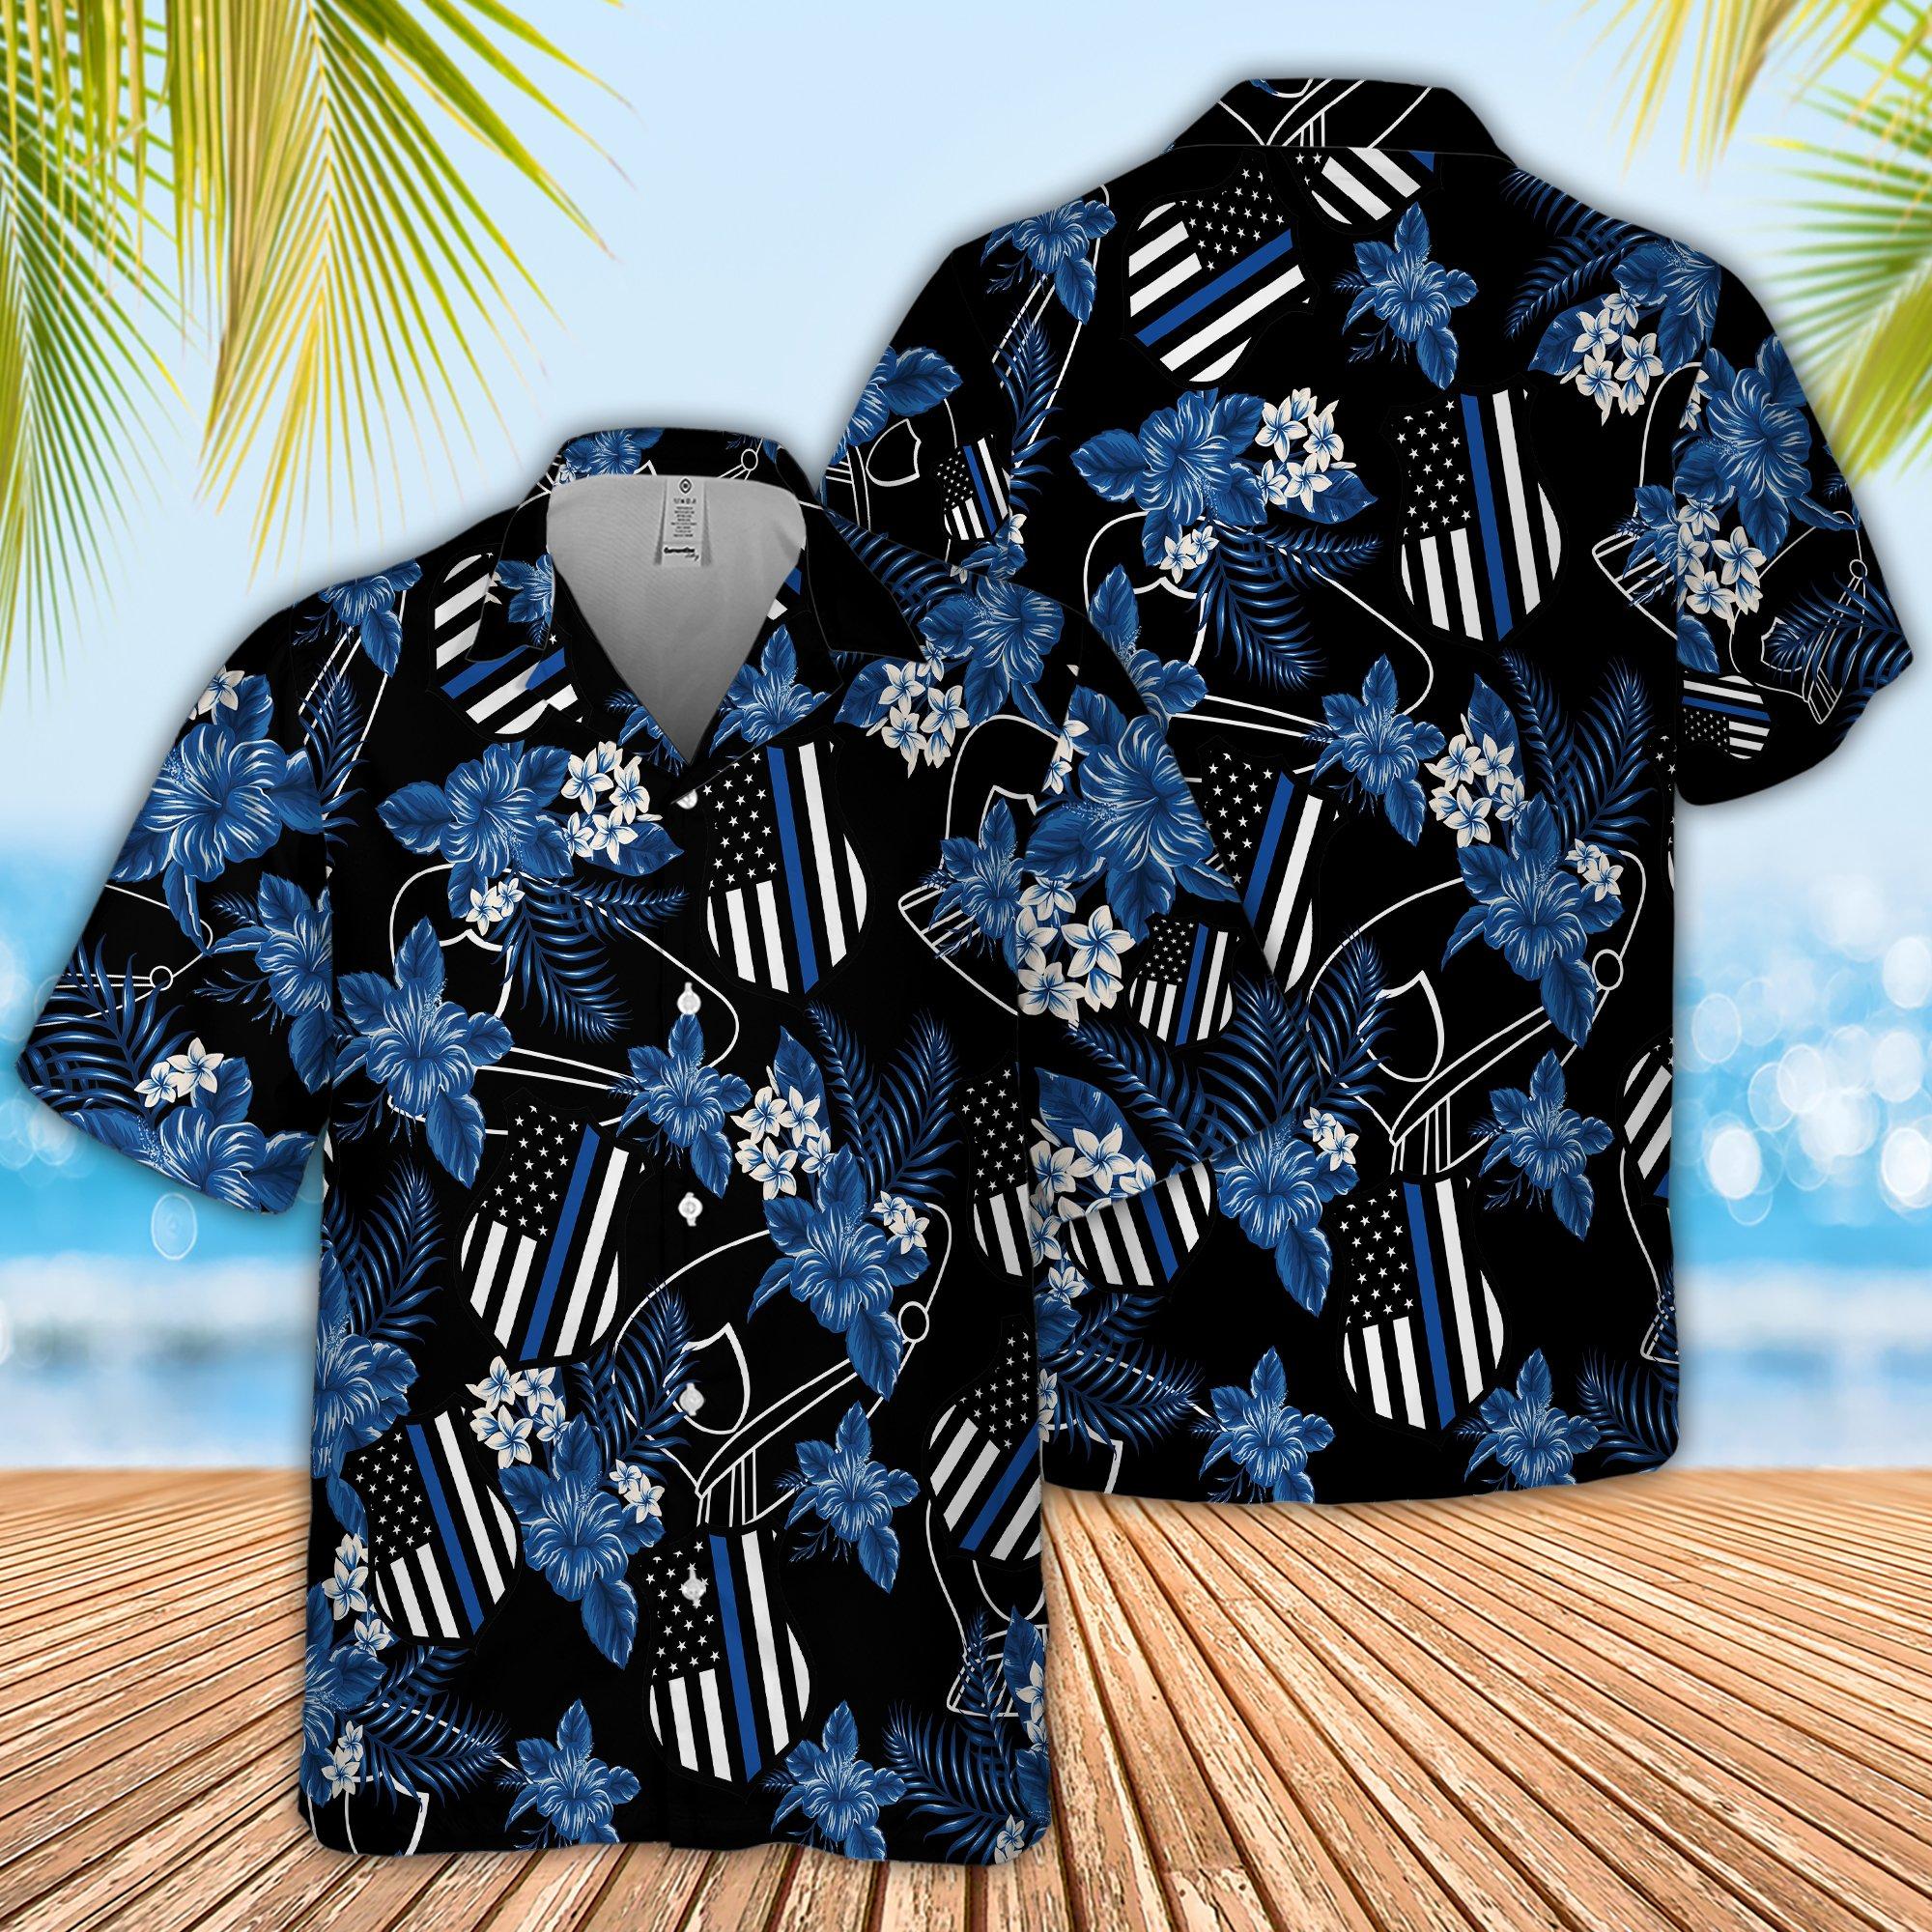 Police Seamless Pattern Hawaiian Shirt 2